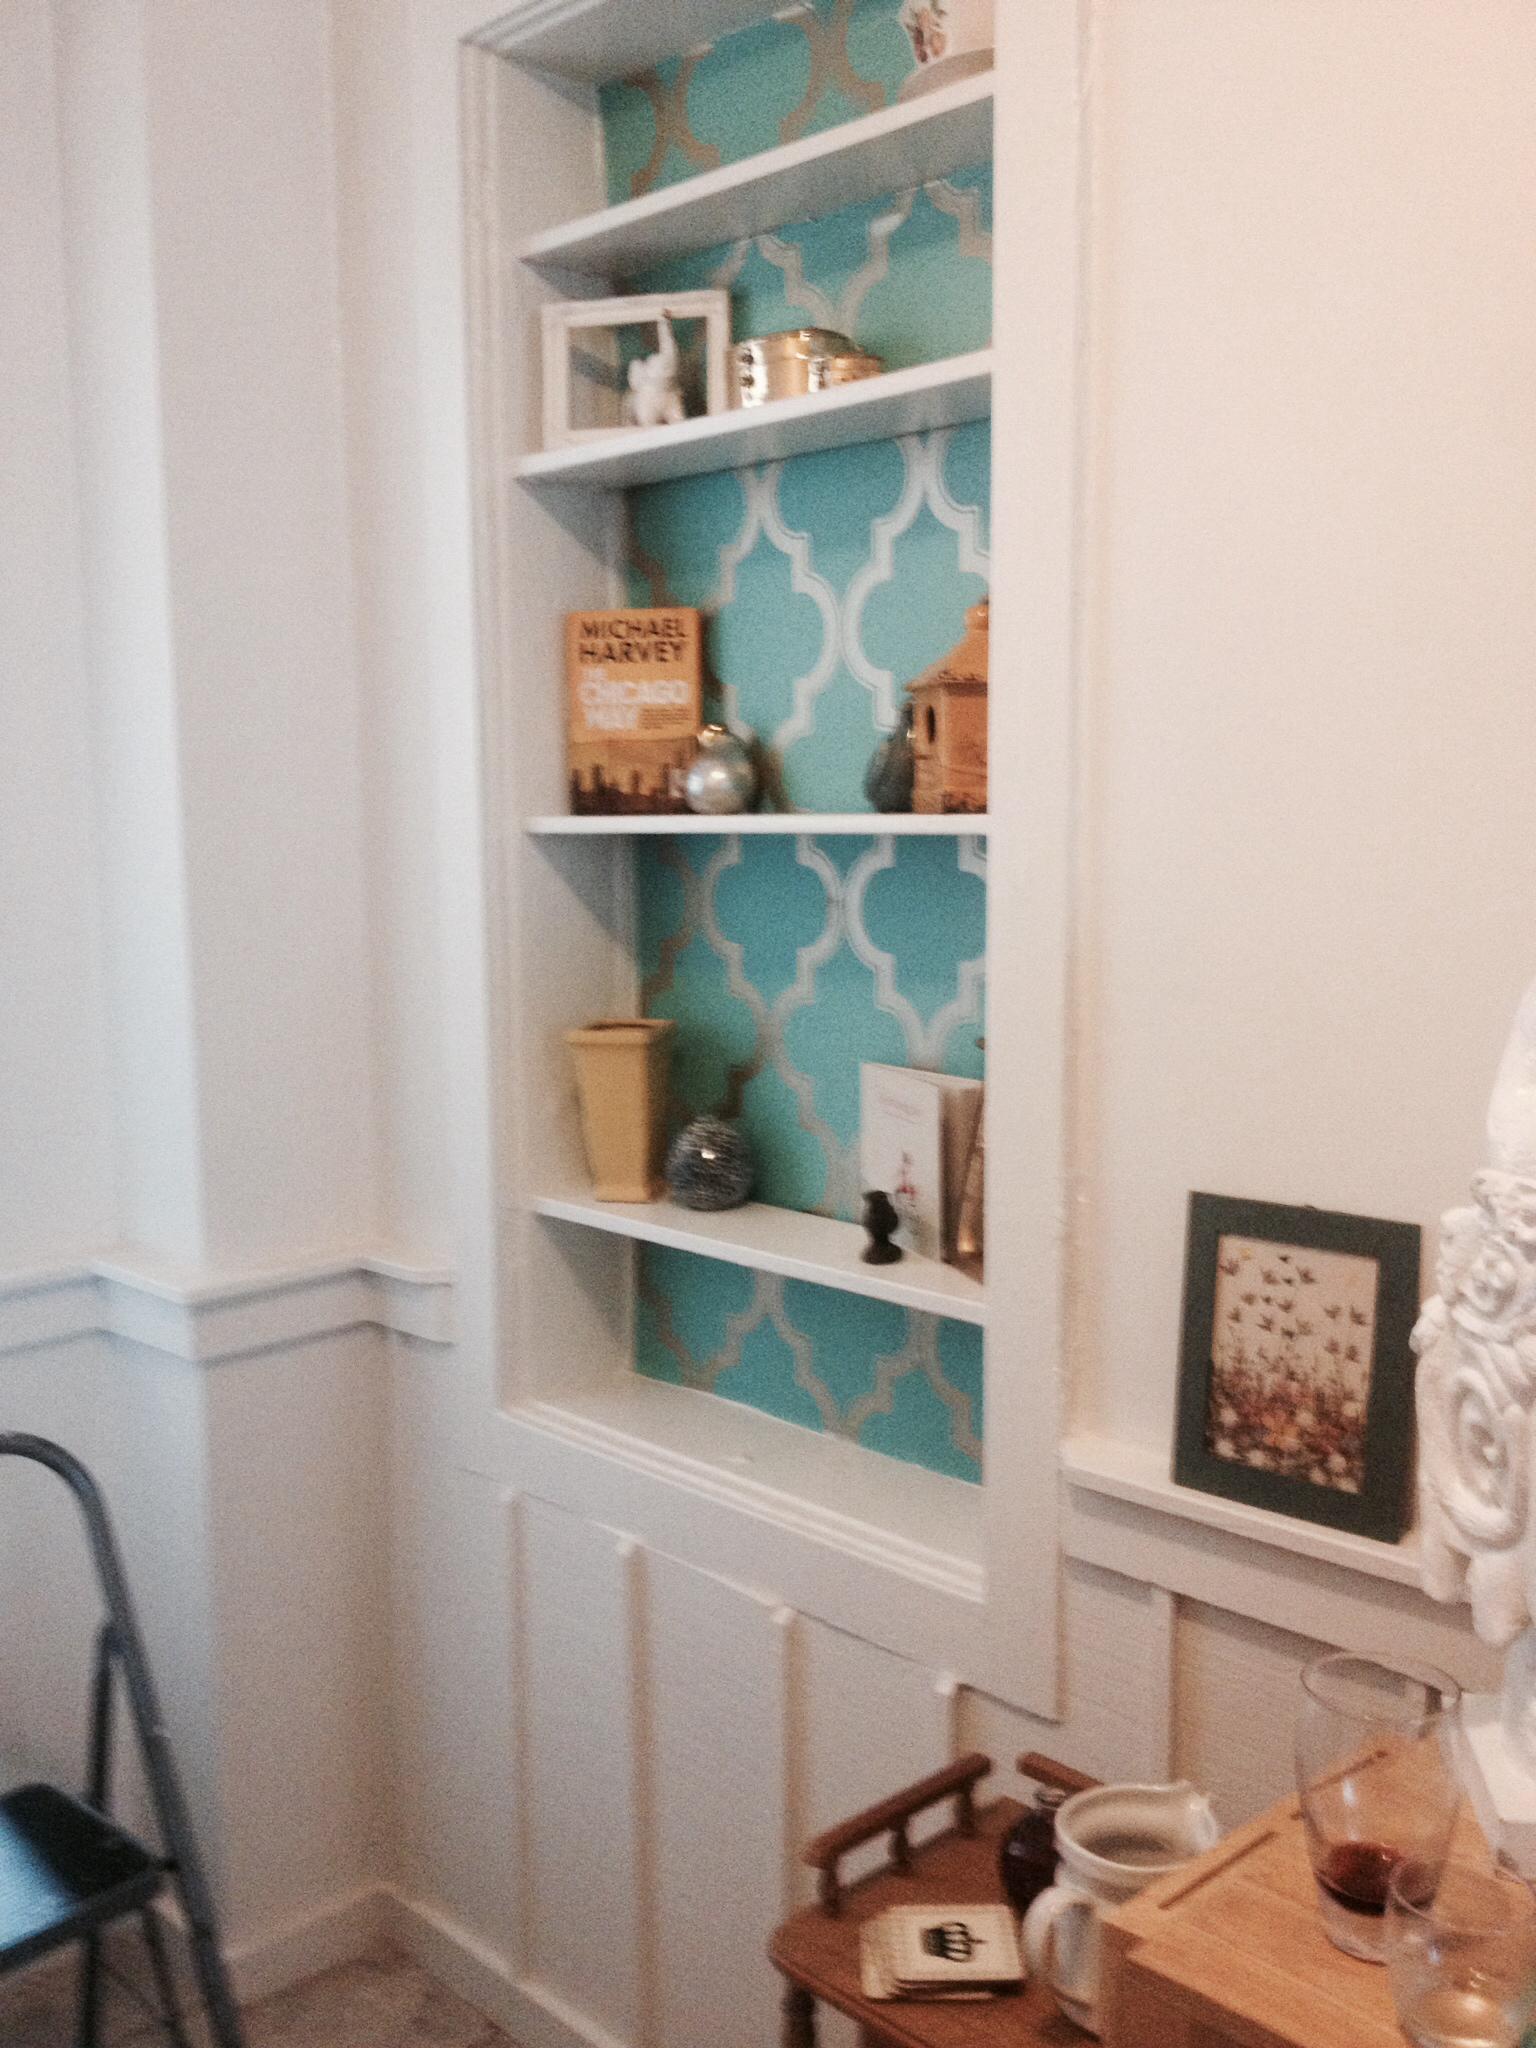 Peel and stick wallpaper Love target Dream Home Pinterest 1536x2048